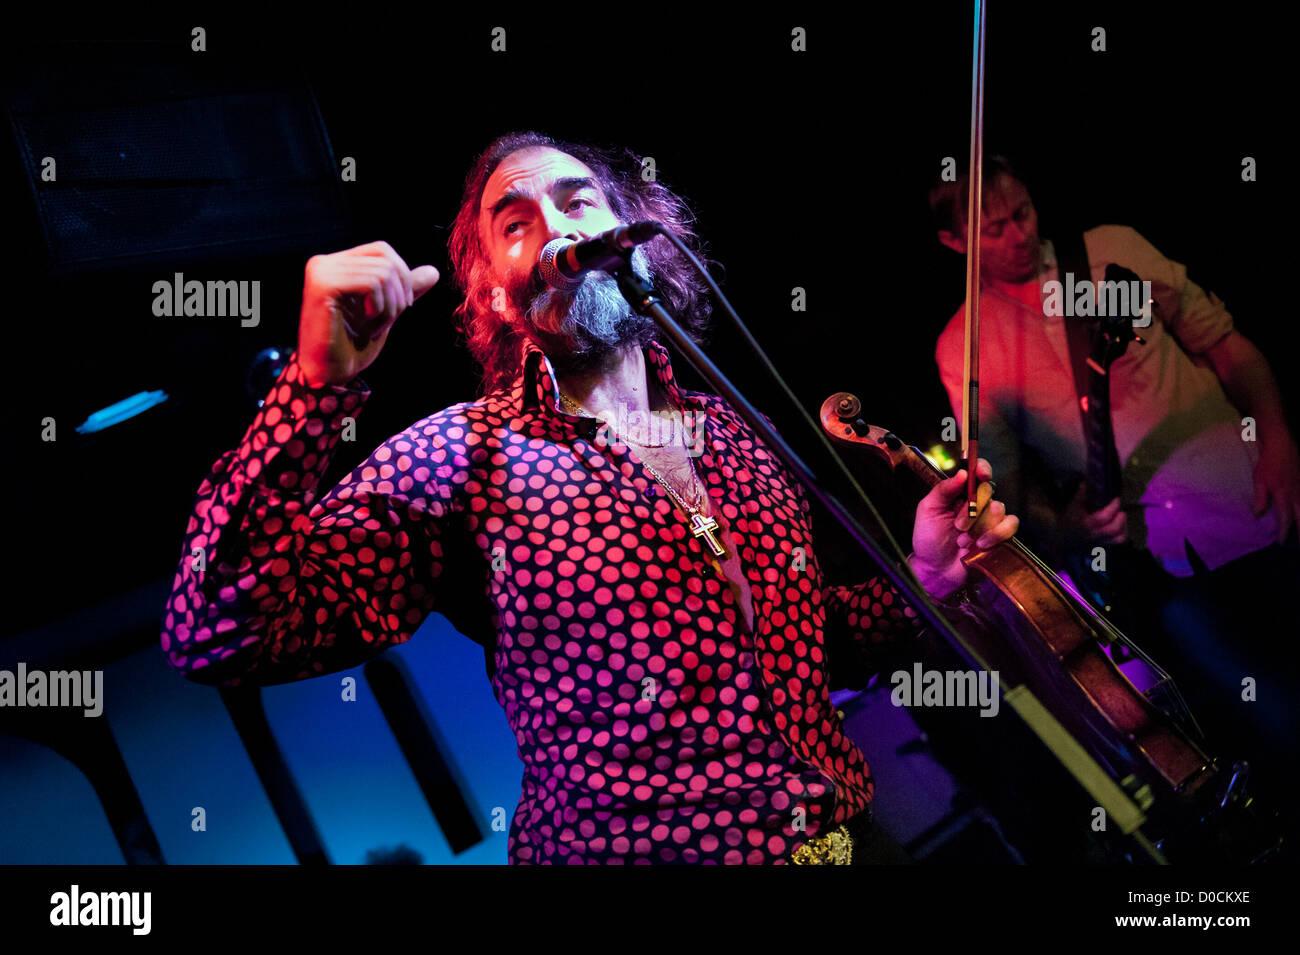 Warren Ellis performing with his alternative rock group Dirty Three at the Glee Club, Birmingham 20 November 2012. - Stock Image